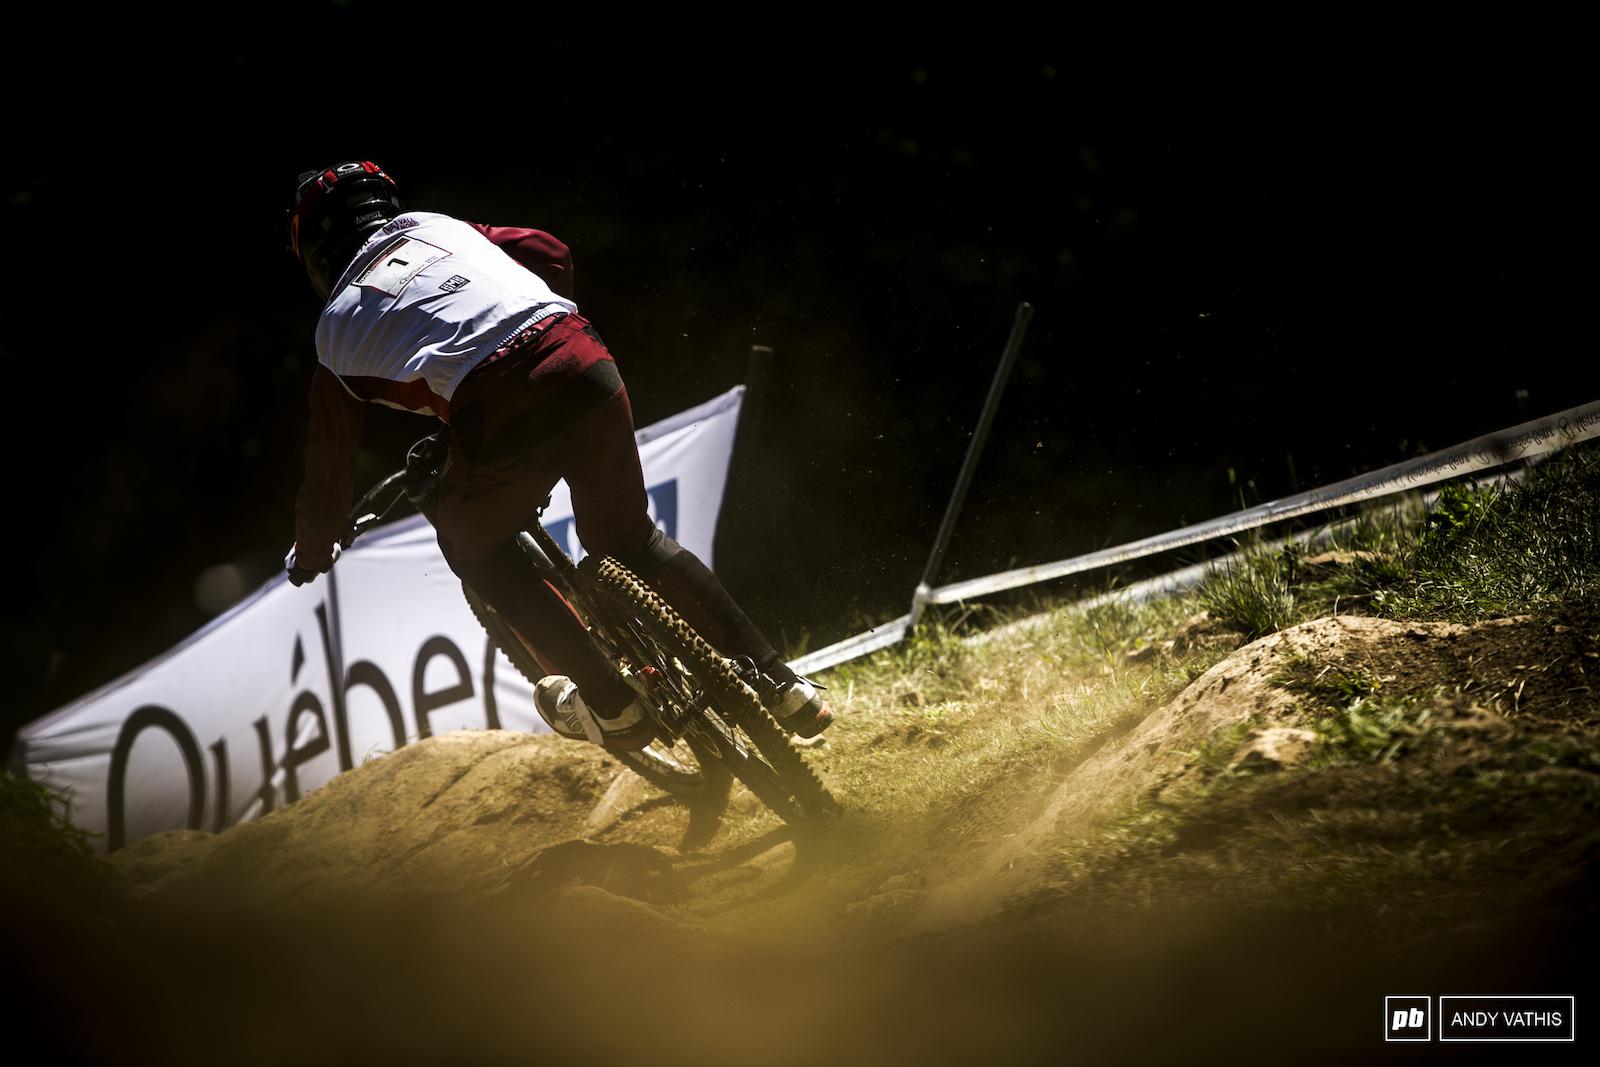 Amaury Pierron kicking up dust.